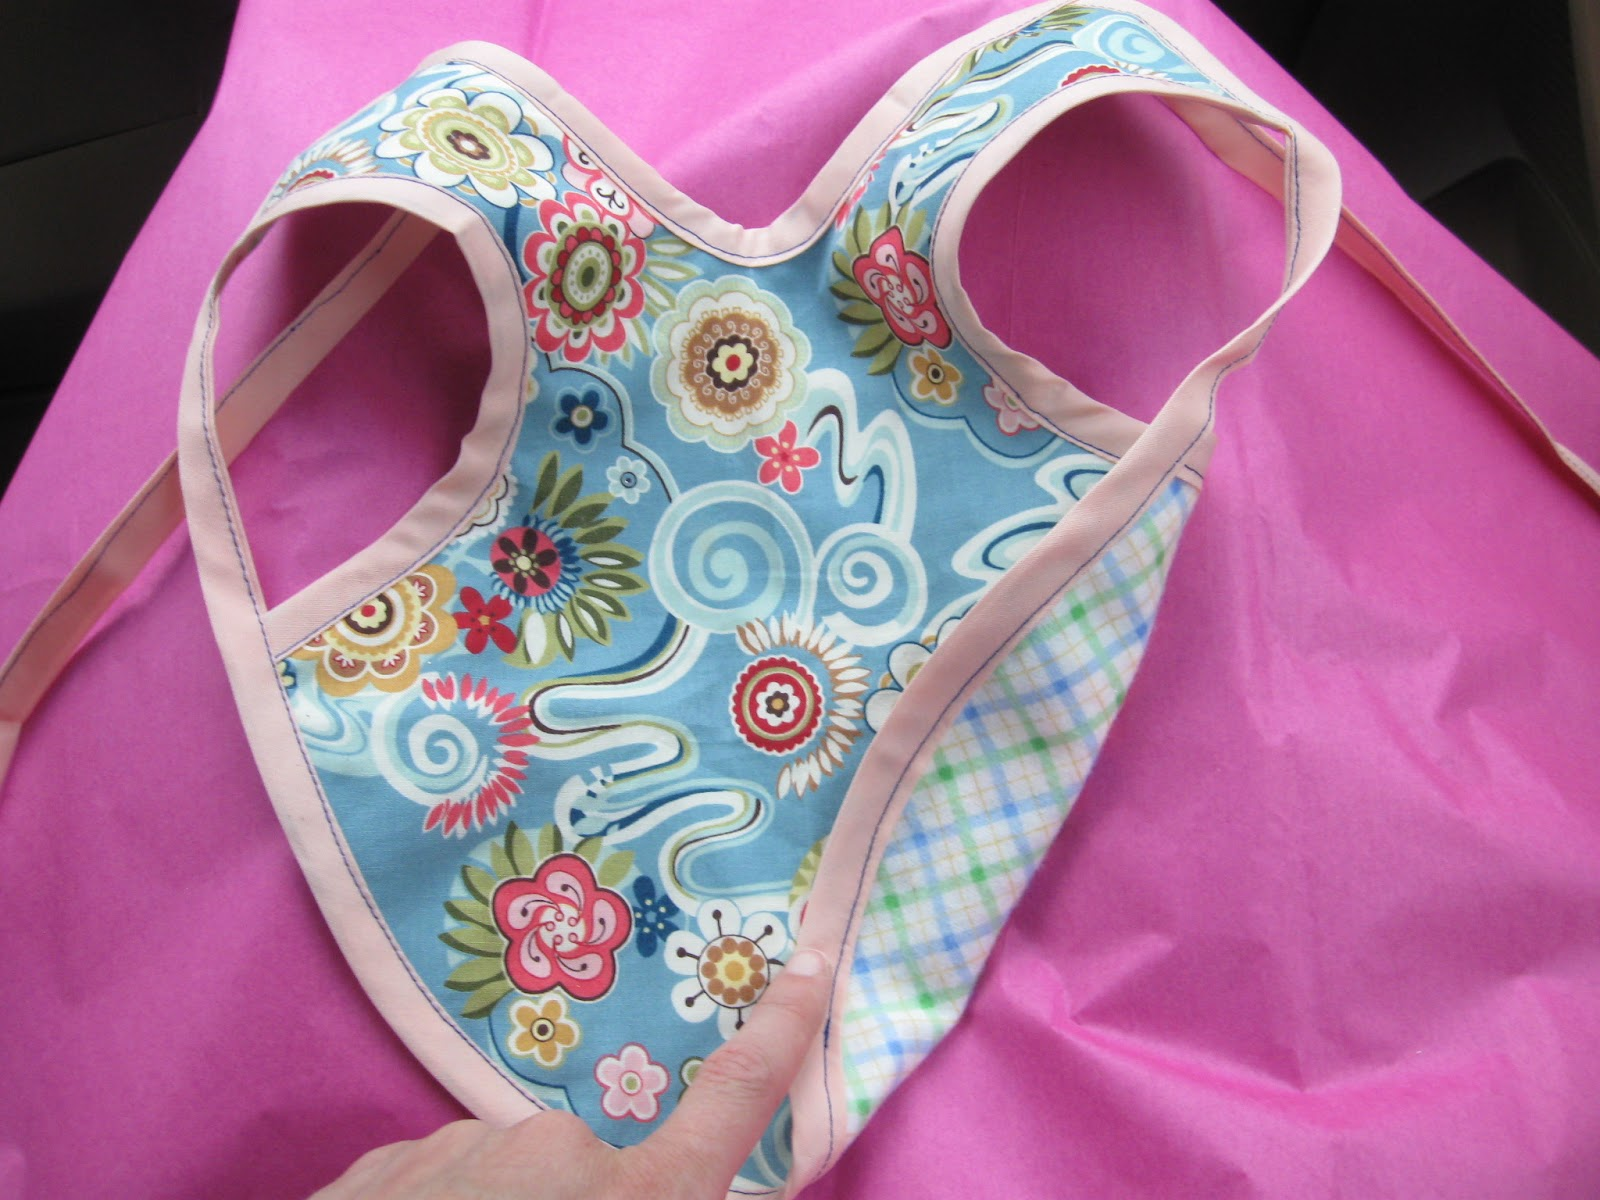 jeanetics handmade baby shower gift